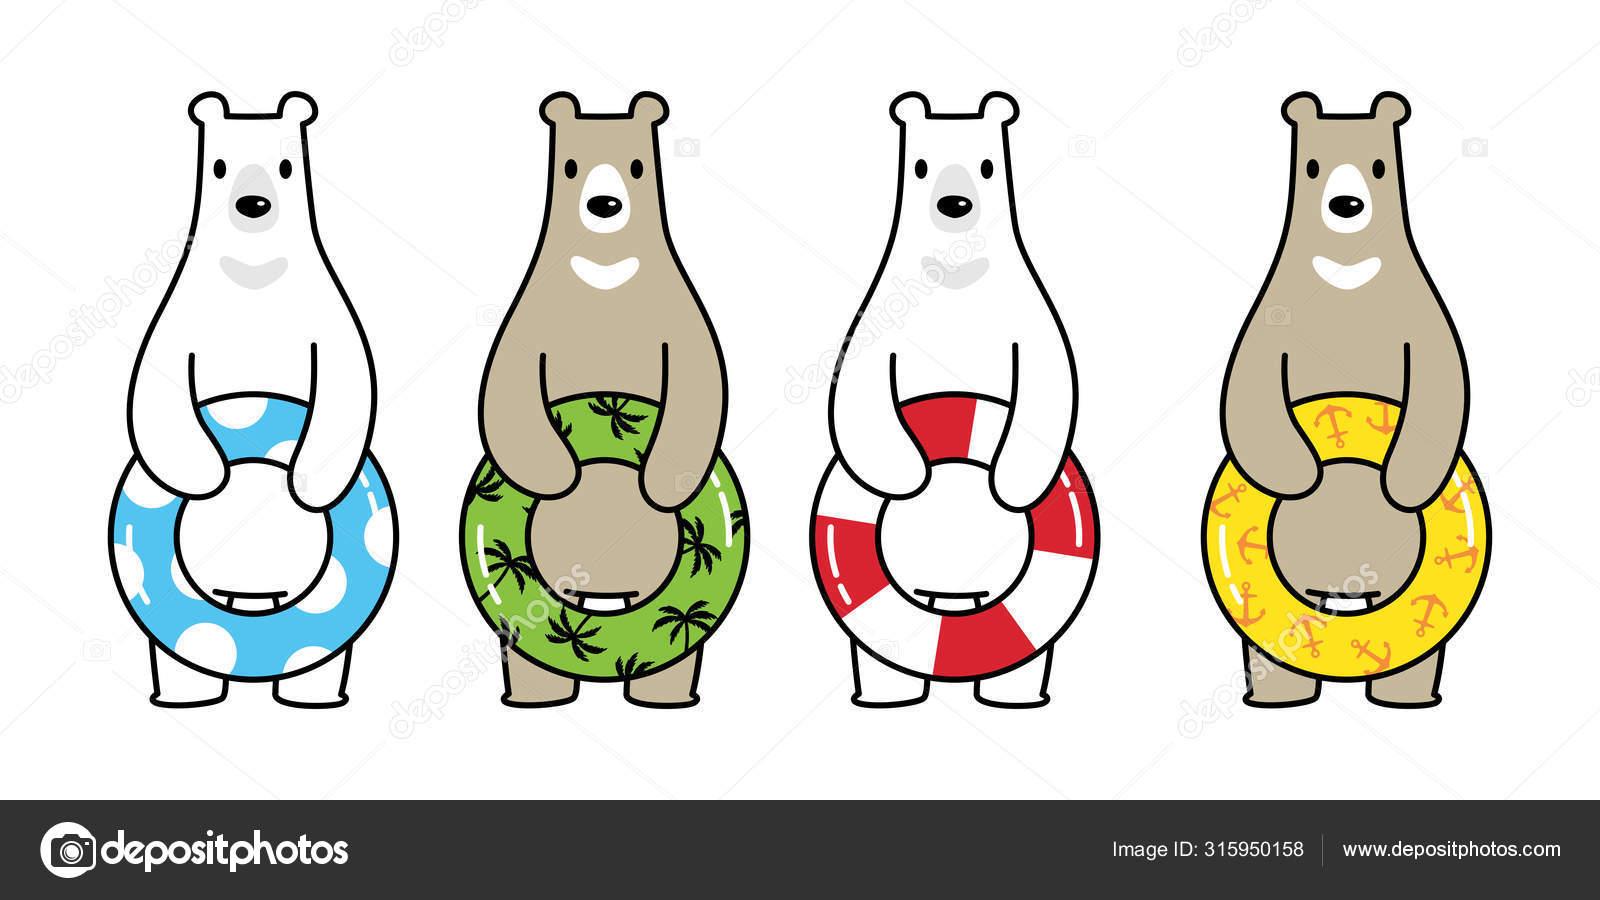 Polar Bear Swimming Stock Illustrations – 172 Polar Bear Swimming Stock  Illustrations, Vectors & Clipart - Dreamstime